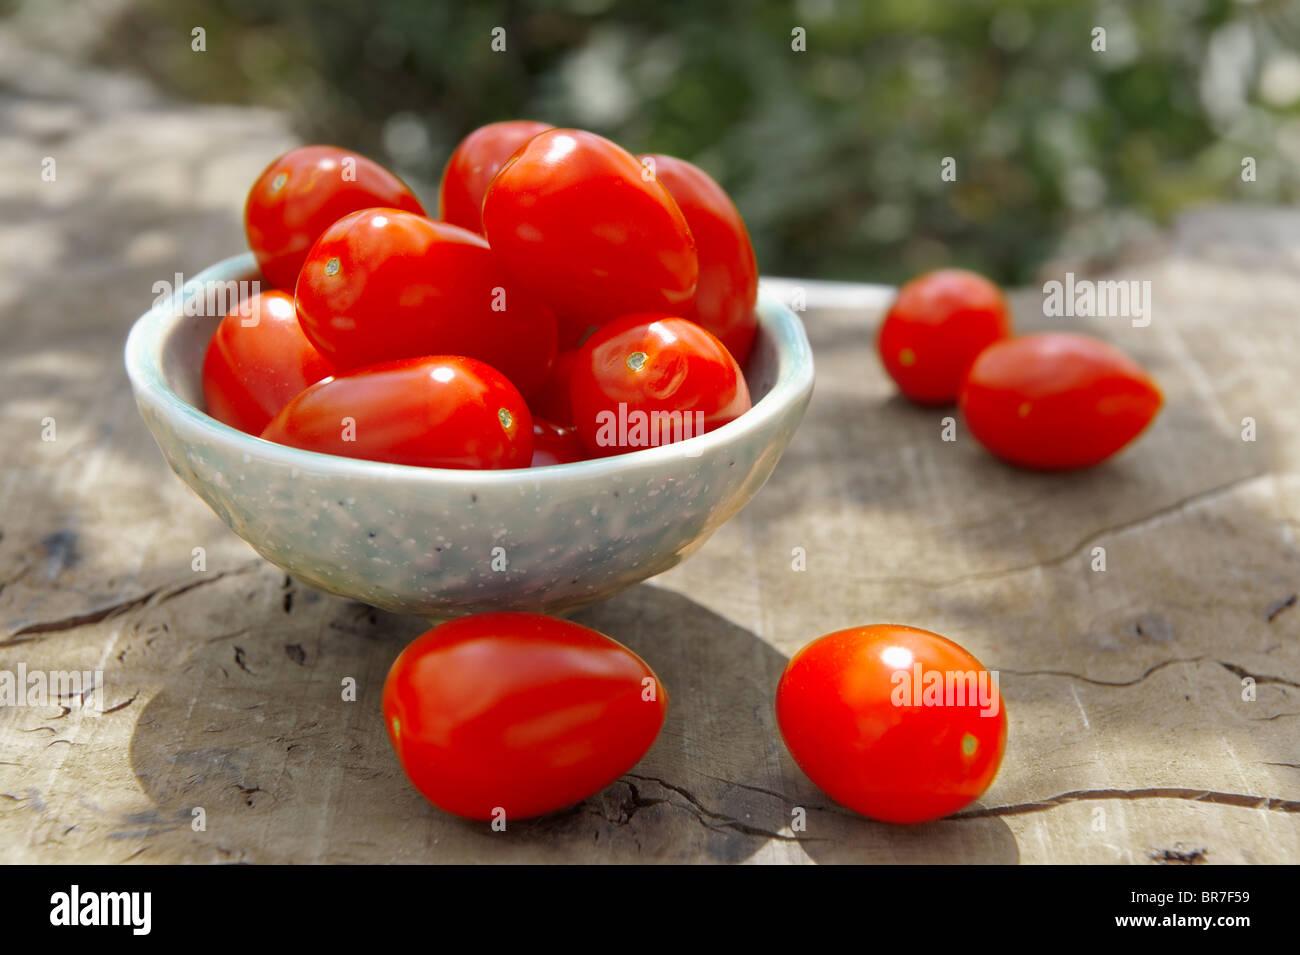 Fresh picked plum tomatoes - Stock Image